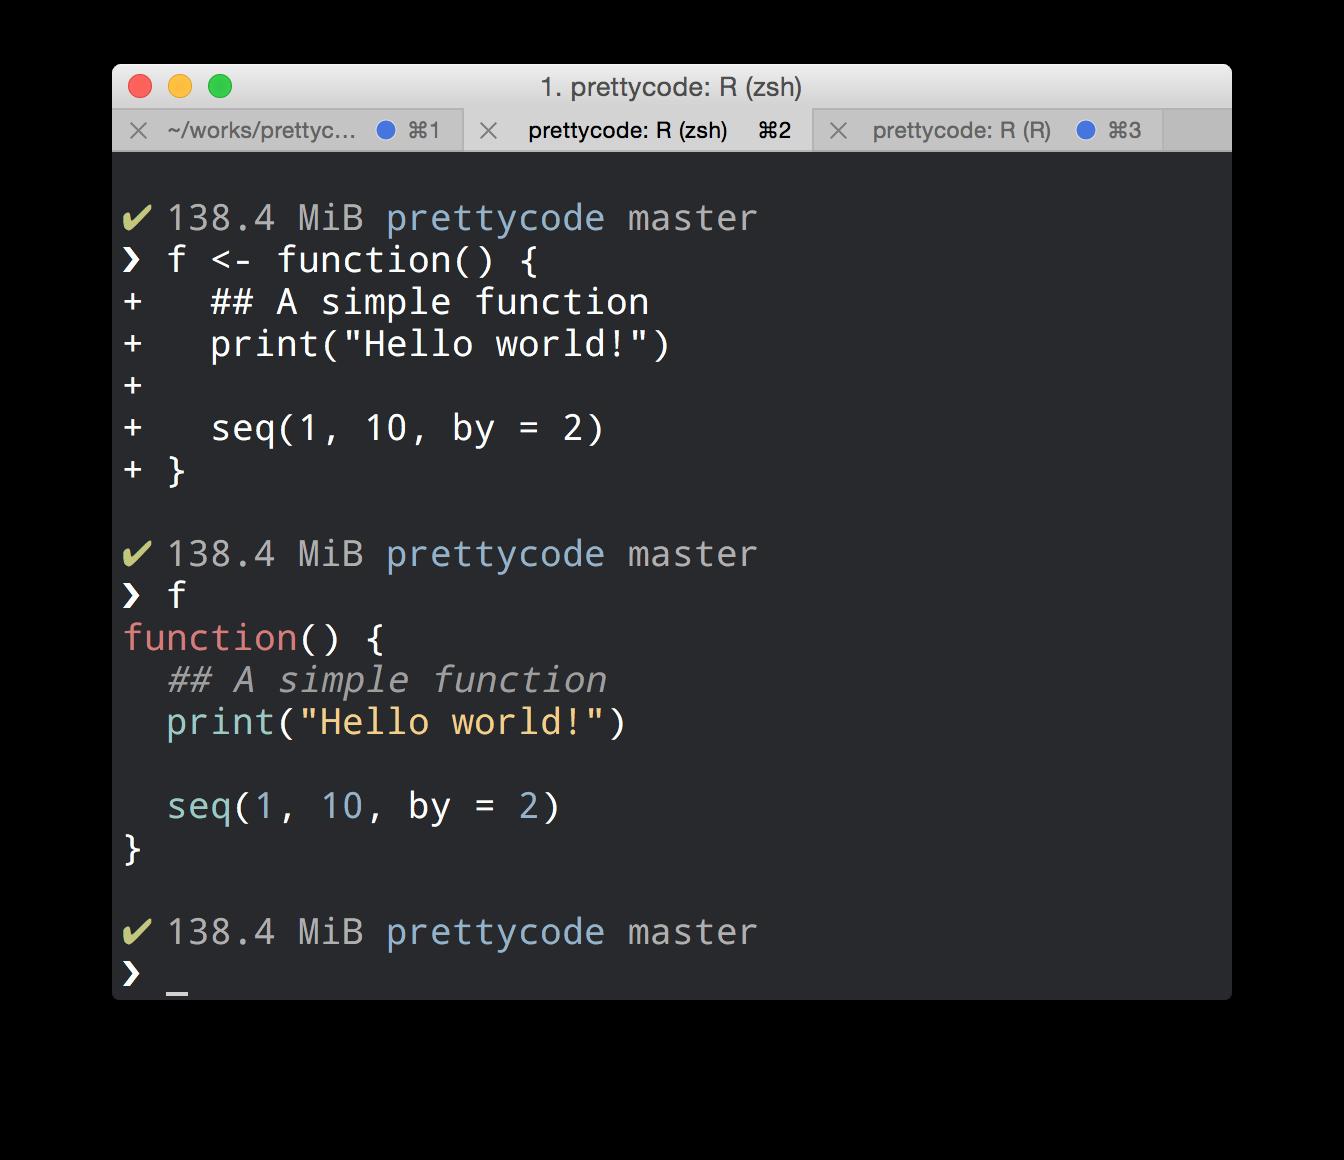 prettycode